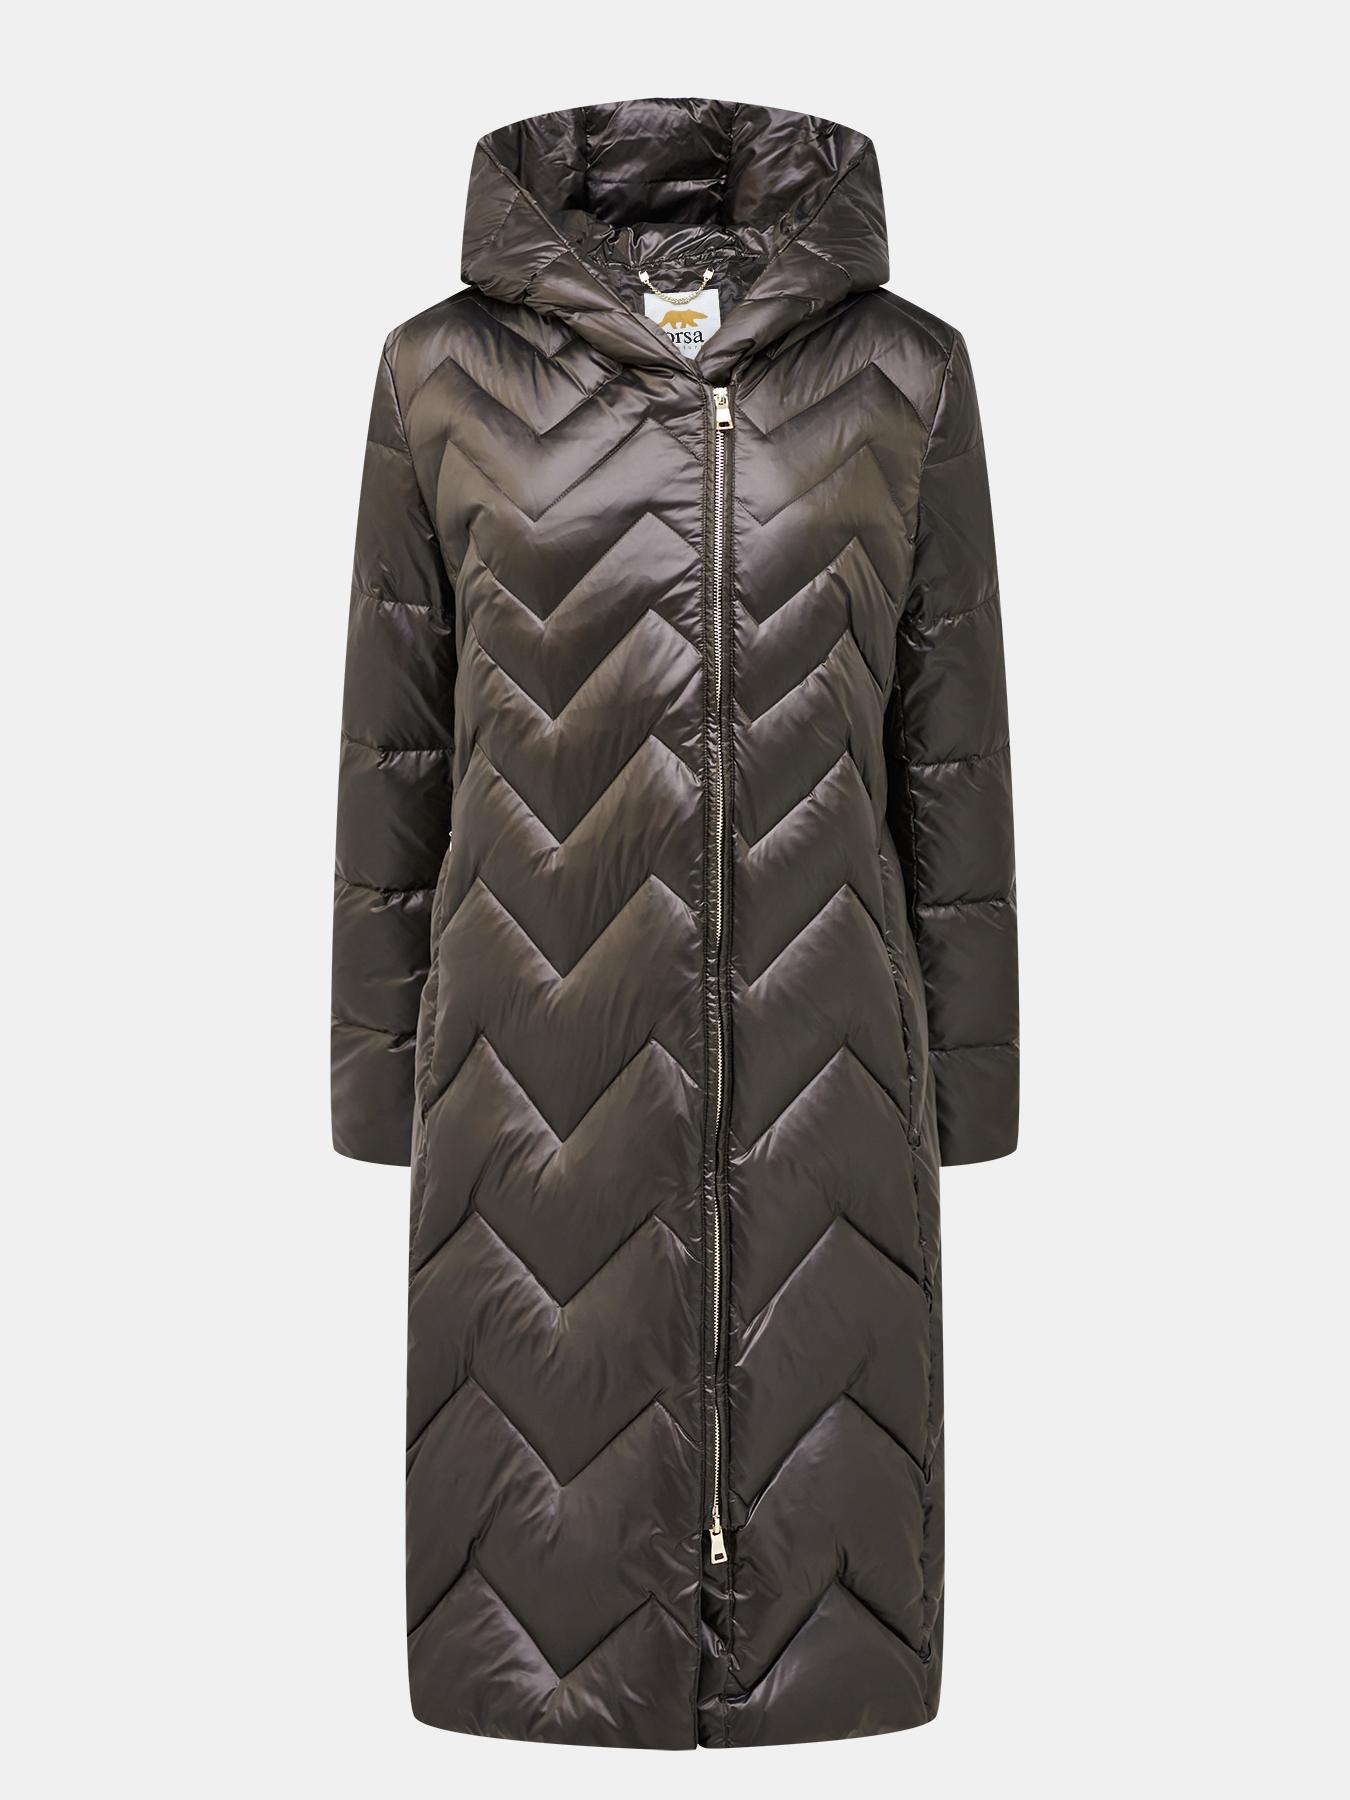 Фото - Пальто ORSA Couture Пальто пальто kata binska пальто длинные